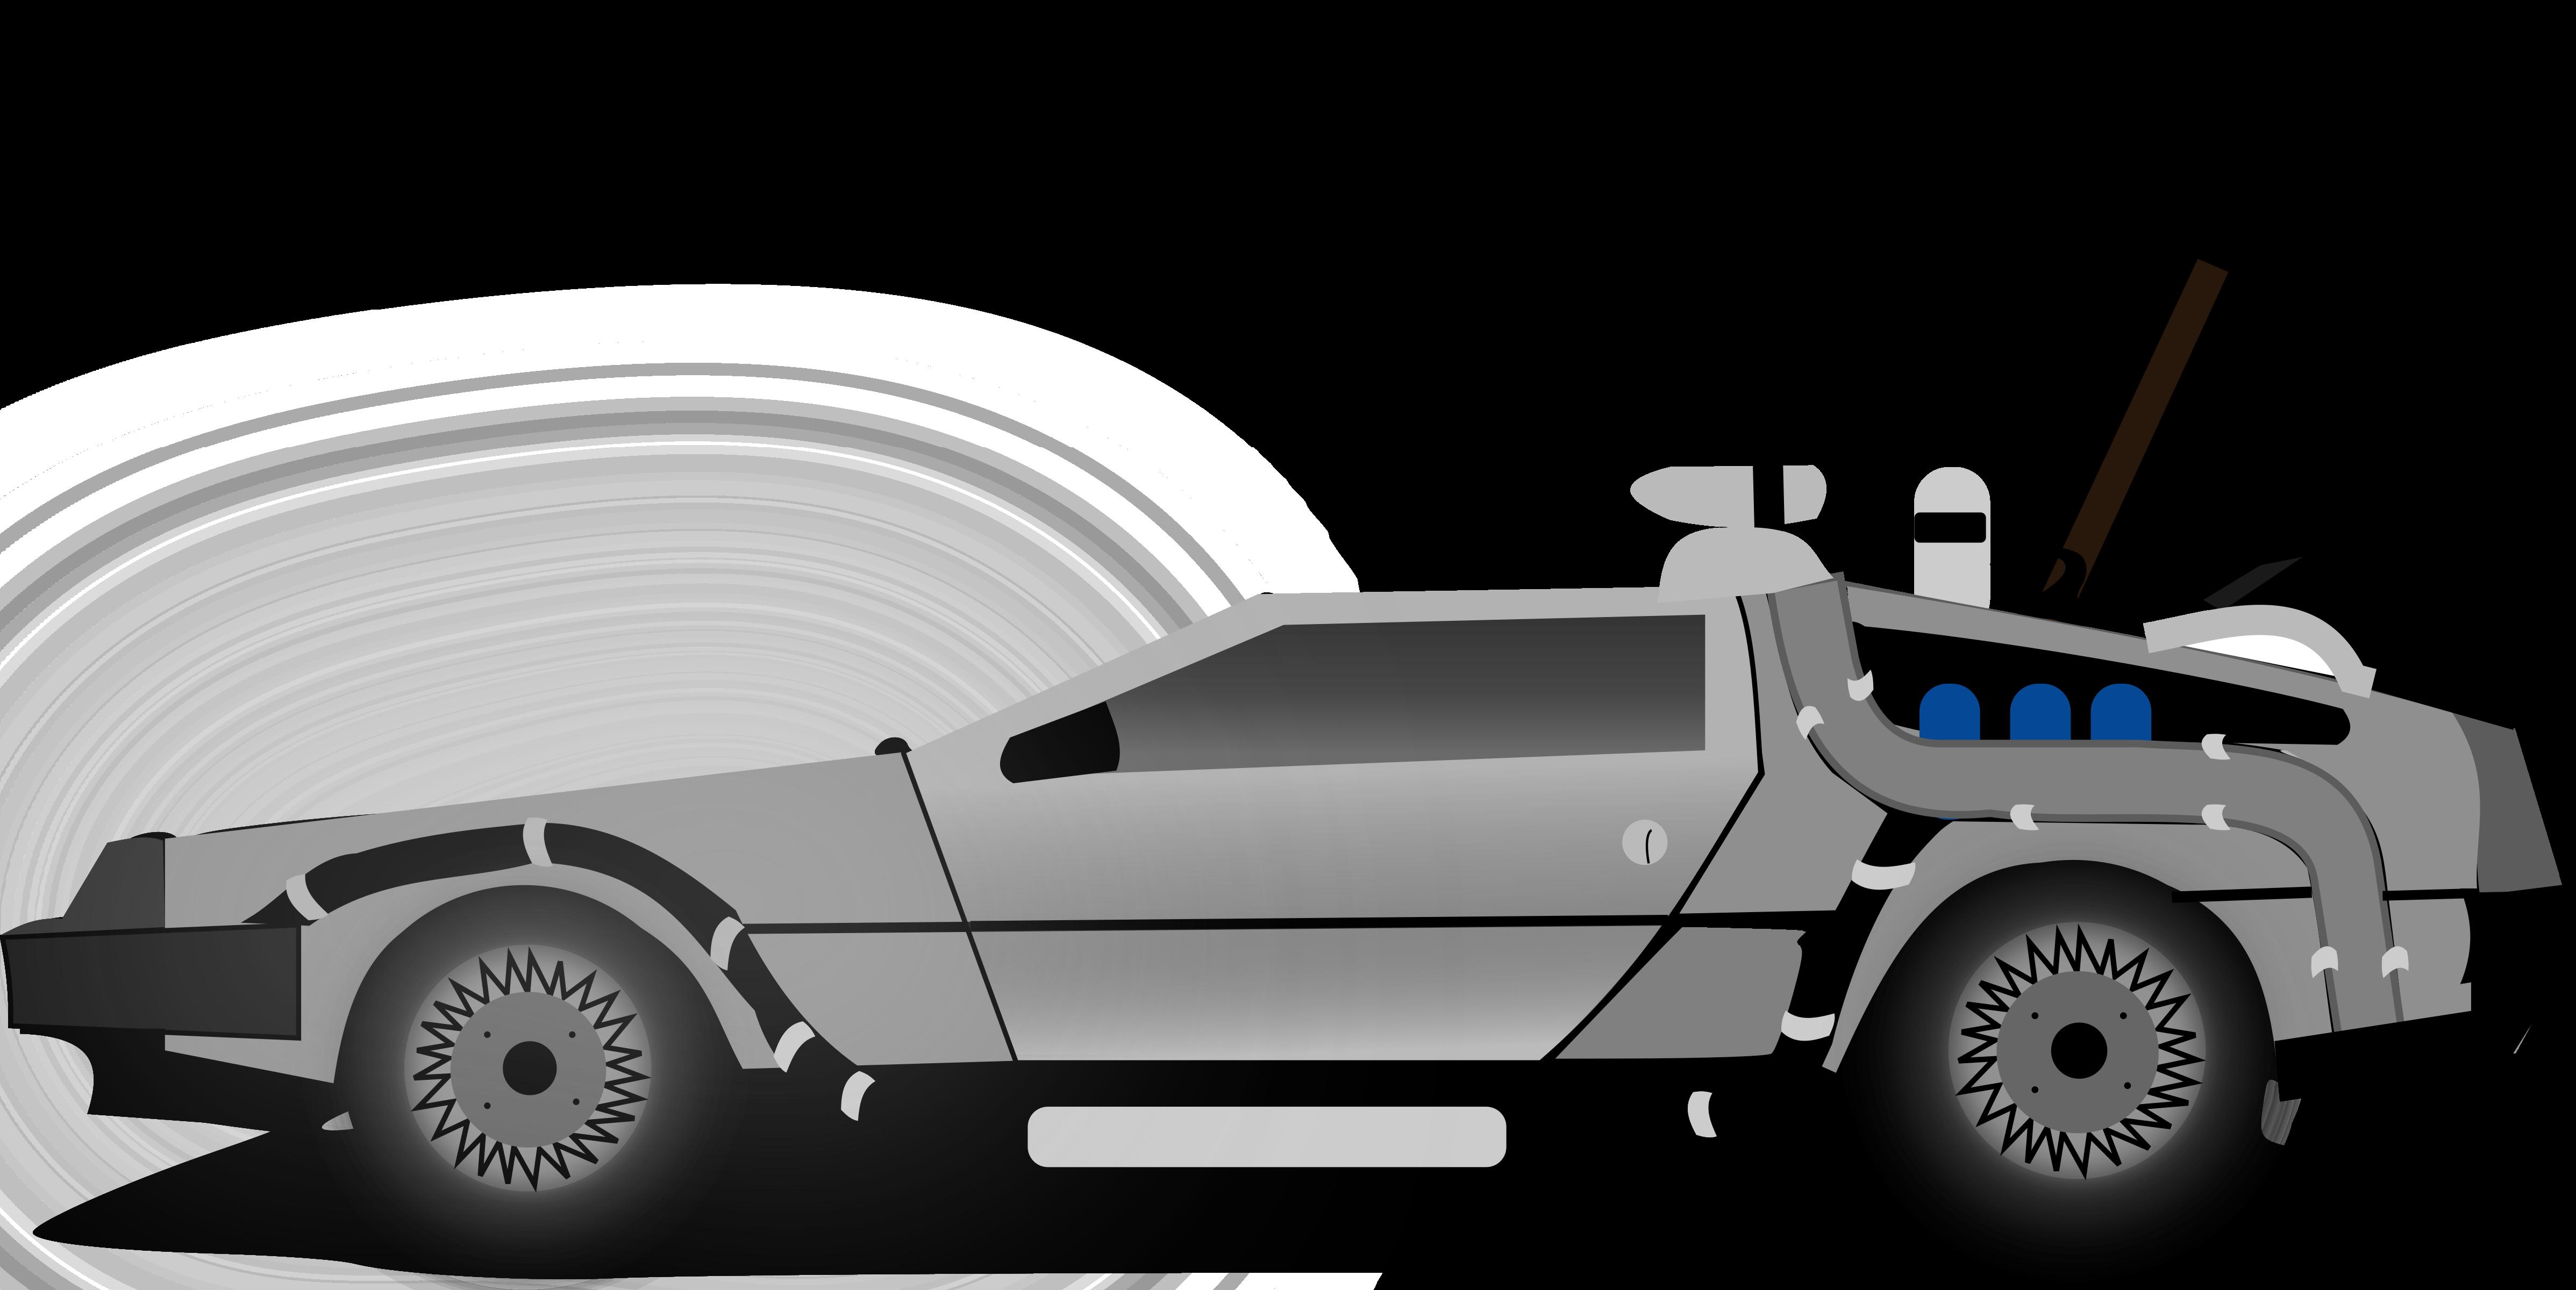 Future car clipart image transparent Clipart - Car delorean image transparent